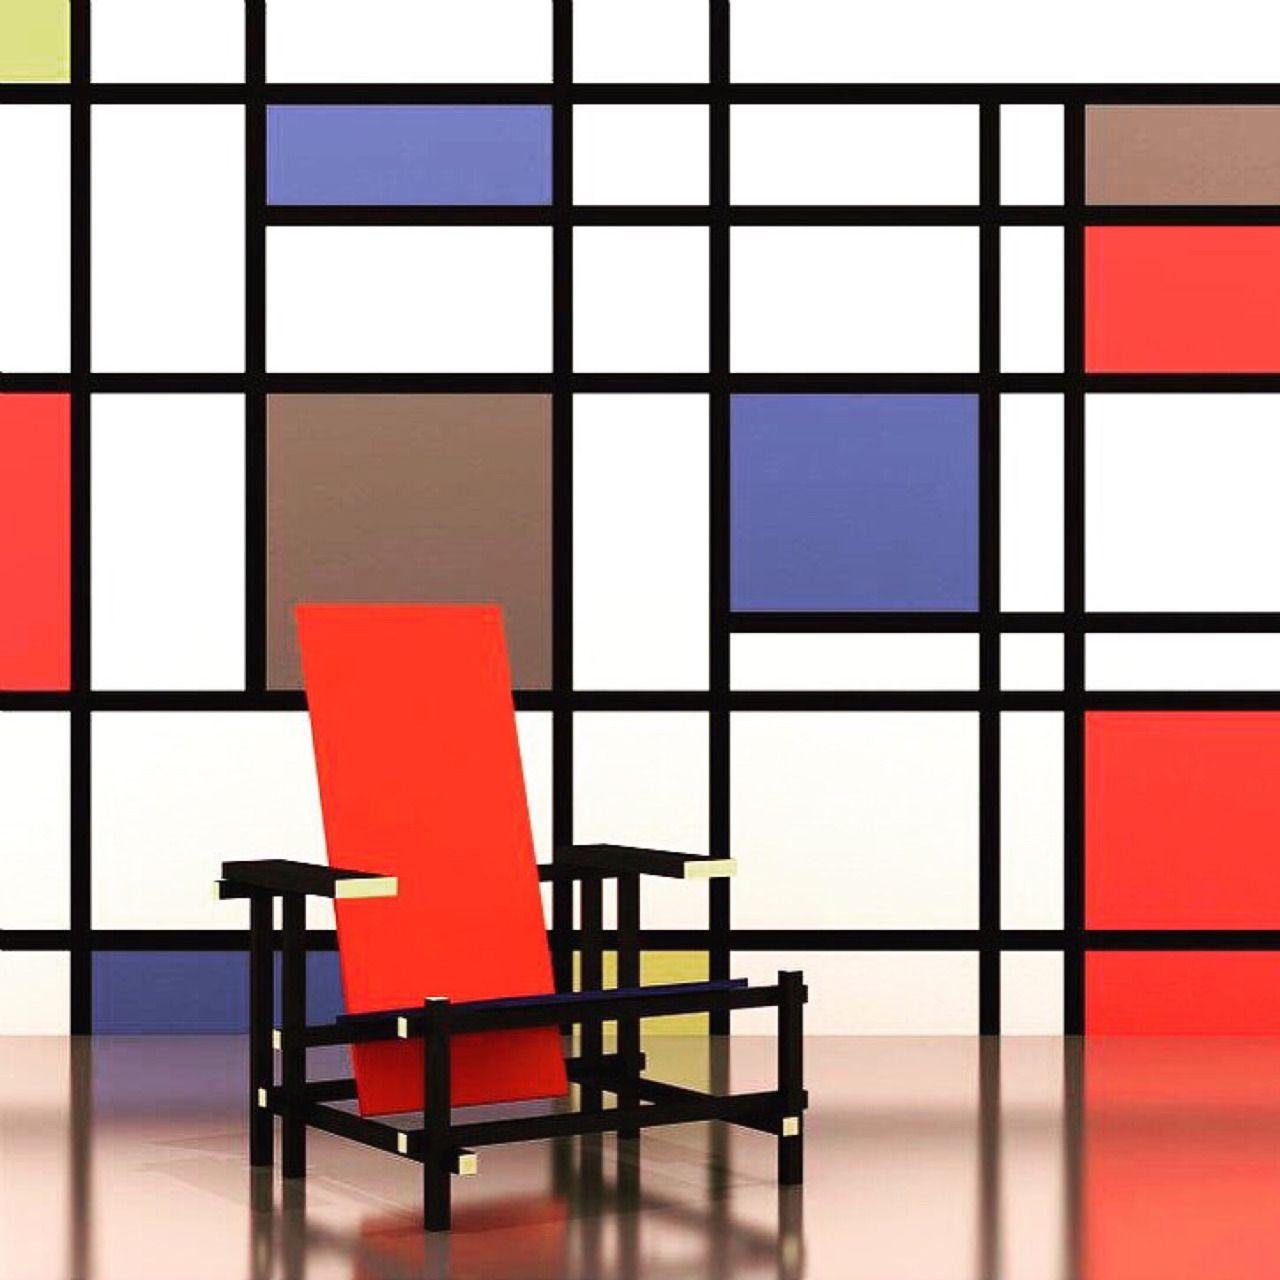 Gerrit rietveld chair for sale - The Patternbase Bauhaus Movement Mondrian Rietveld Chair